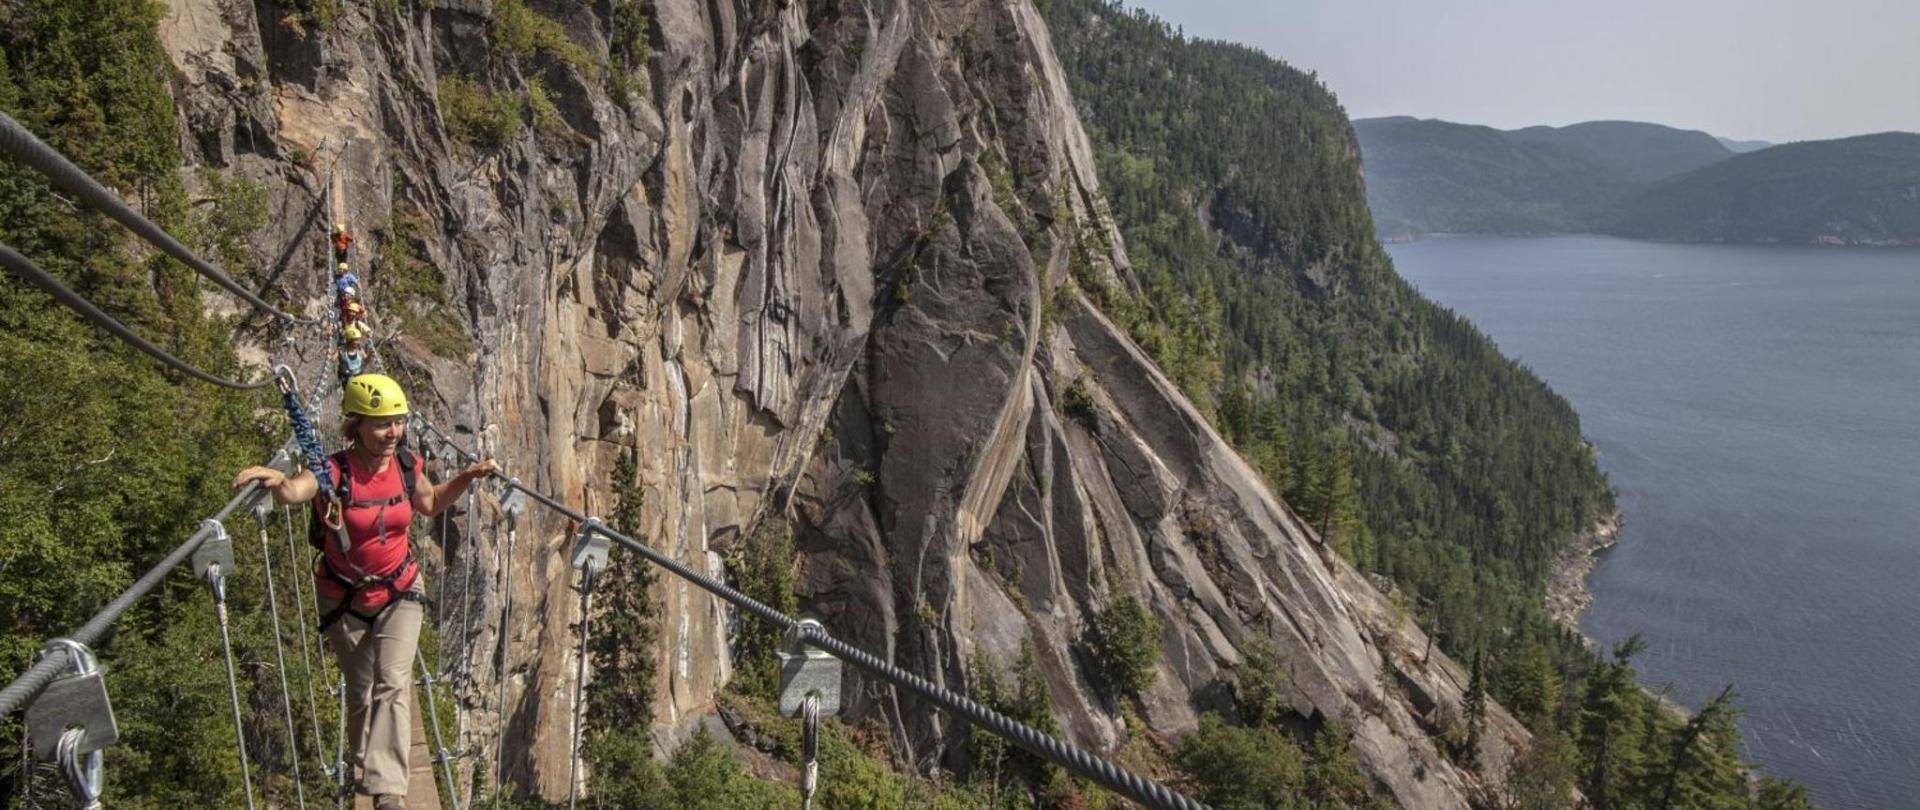 parc-national-du-fjord-du-saguenay-c-boran-richard.jpg